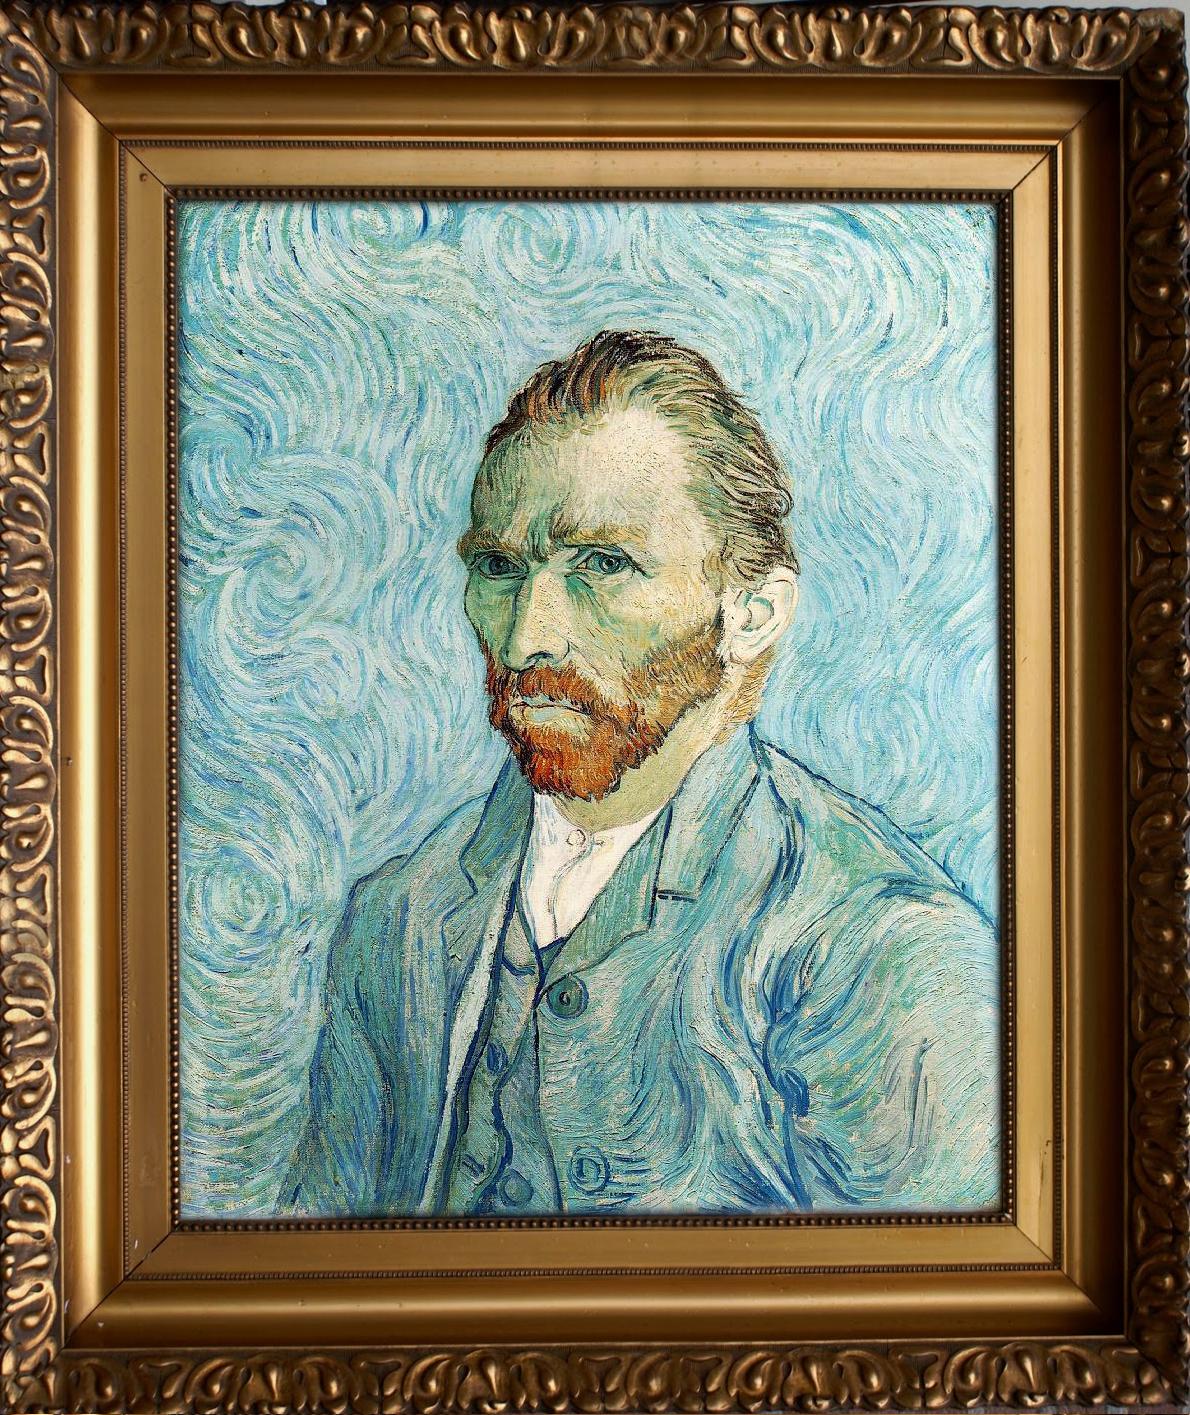 tadao cern tadaocern art Mimic copy real portrait famopus artist vincent van gogh funny  fun humor